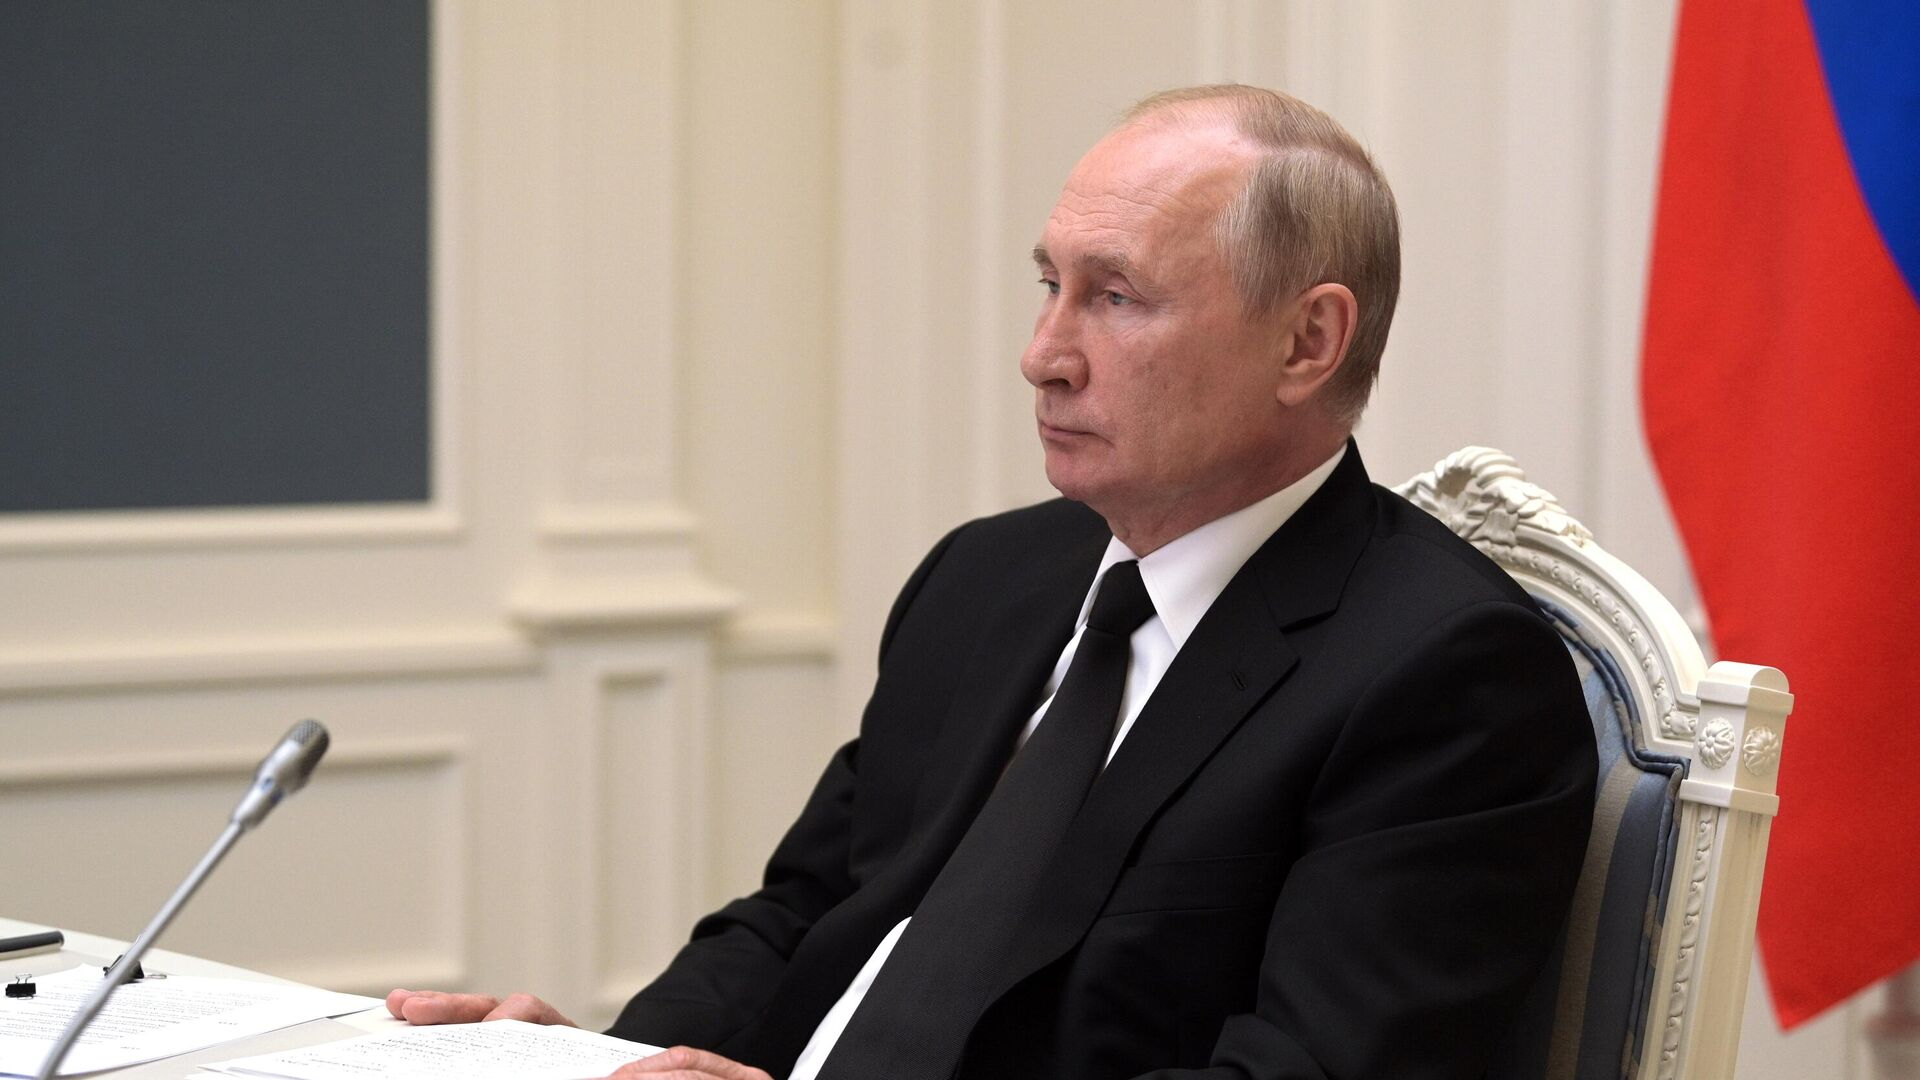 Президент РФ Владимир Путин - Sputnik Беларусь, 1920, 06.10.2021